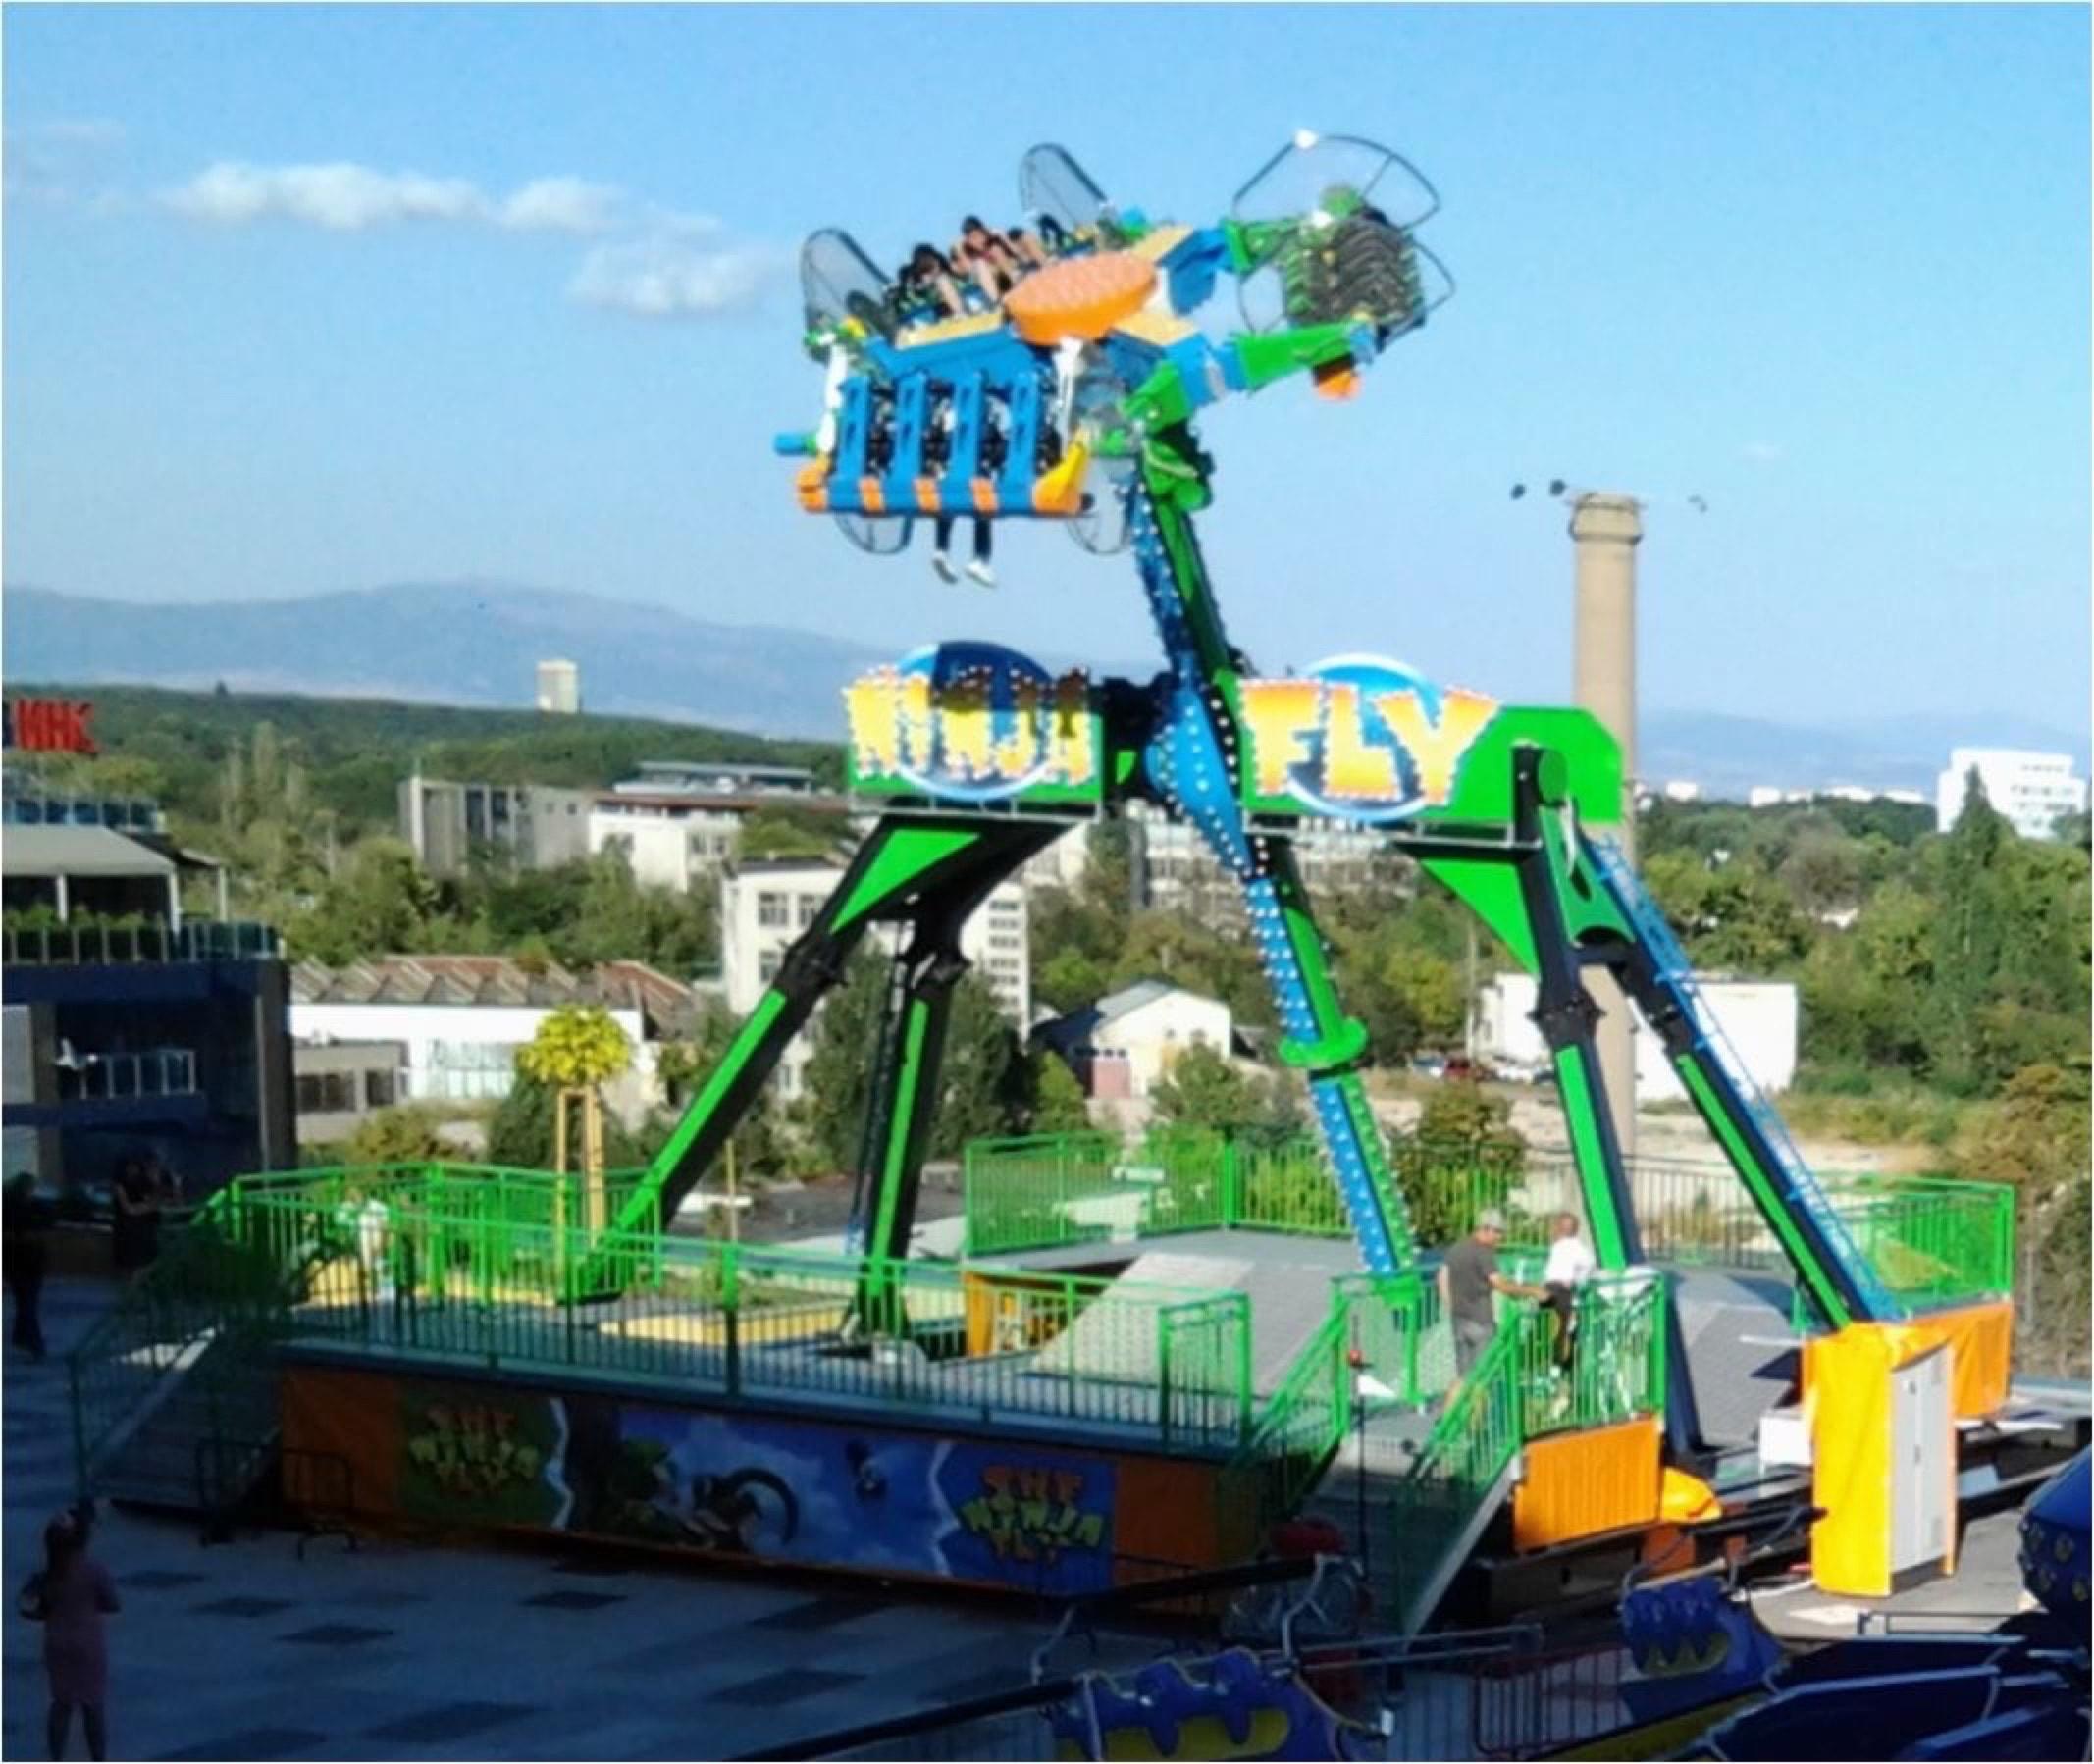 Mini Loop Fighter - The Ninja Fly - Technical Park ...